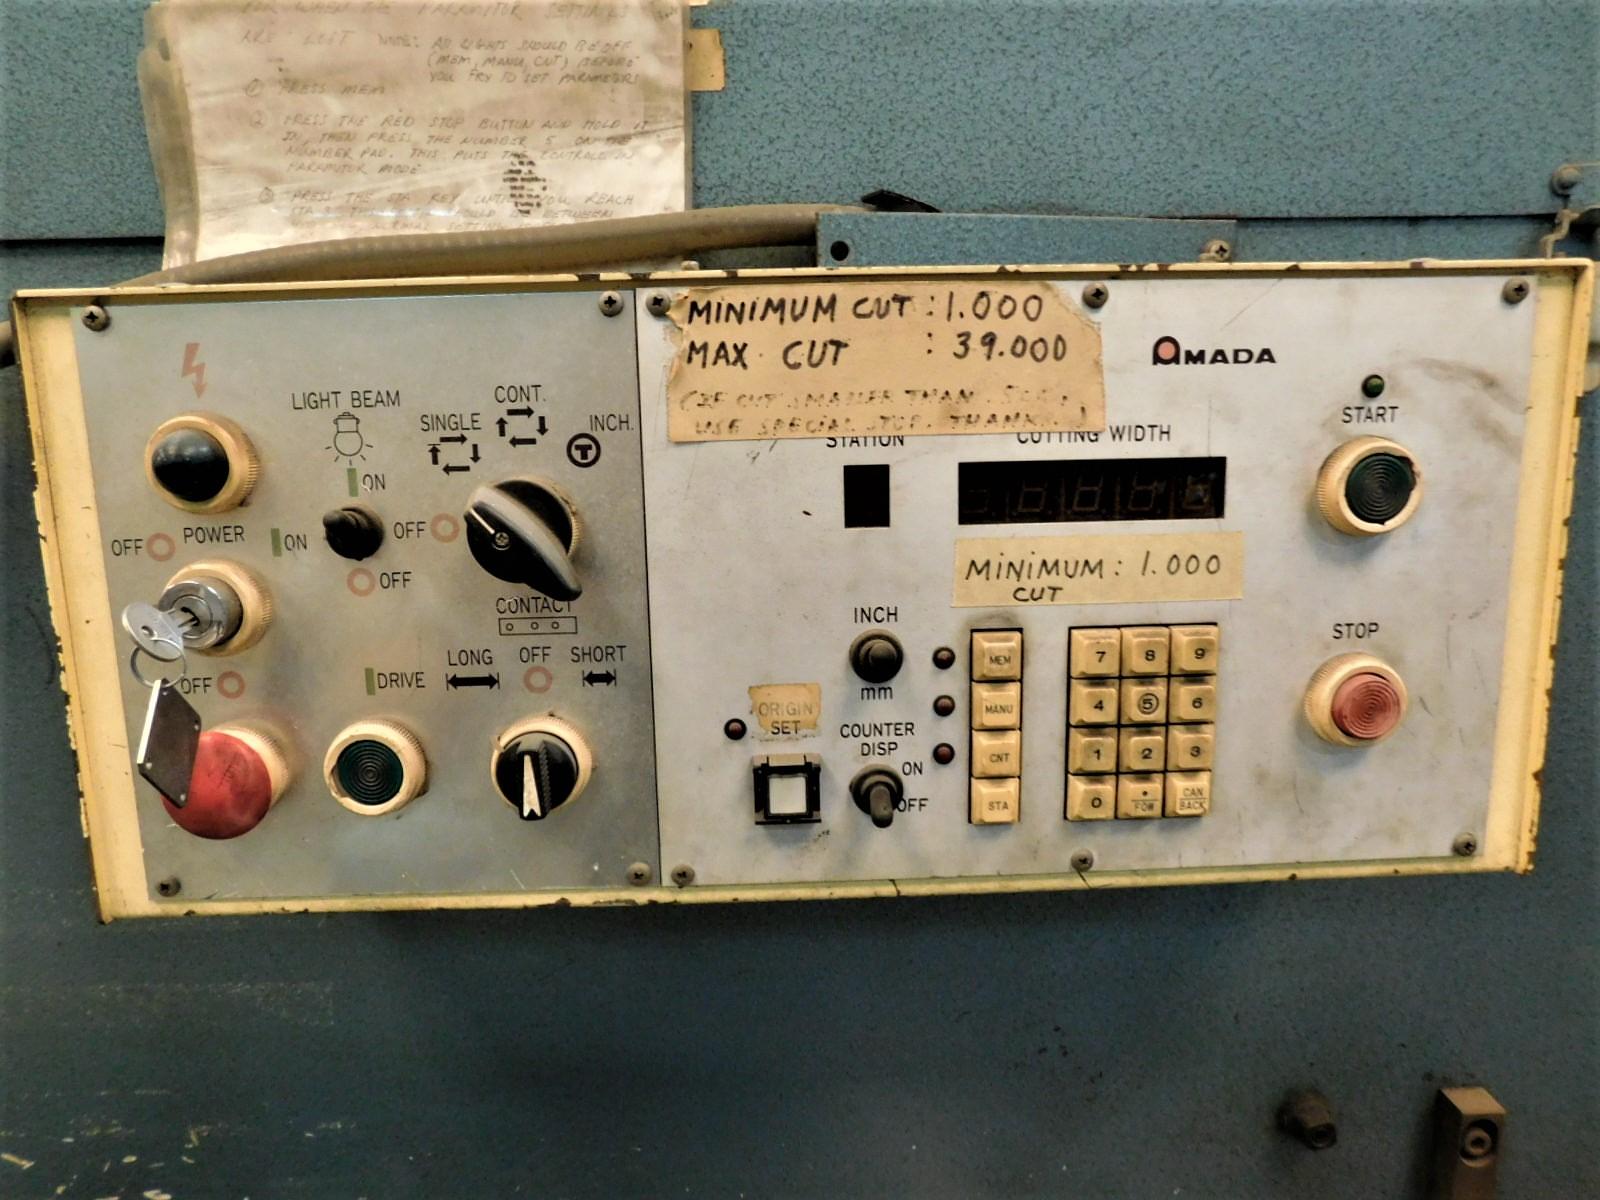 "Lot 11 - 1985 AMADA M-3060 SHEAR, 120.47"" X .25"" CAPACITY, HYDRAULIC, AMADA CONTROL, 60 SPM, RIGHT HAND"